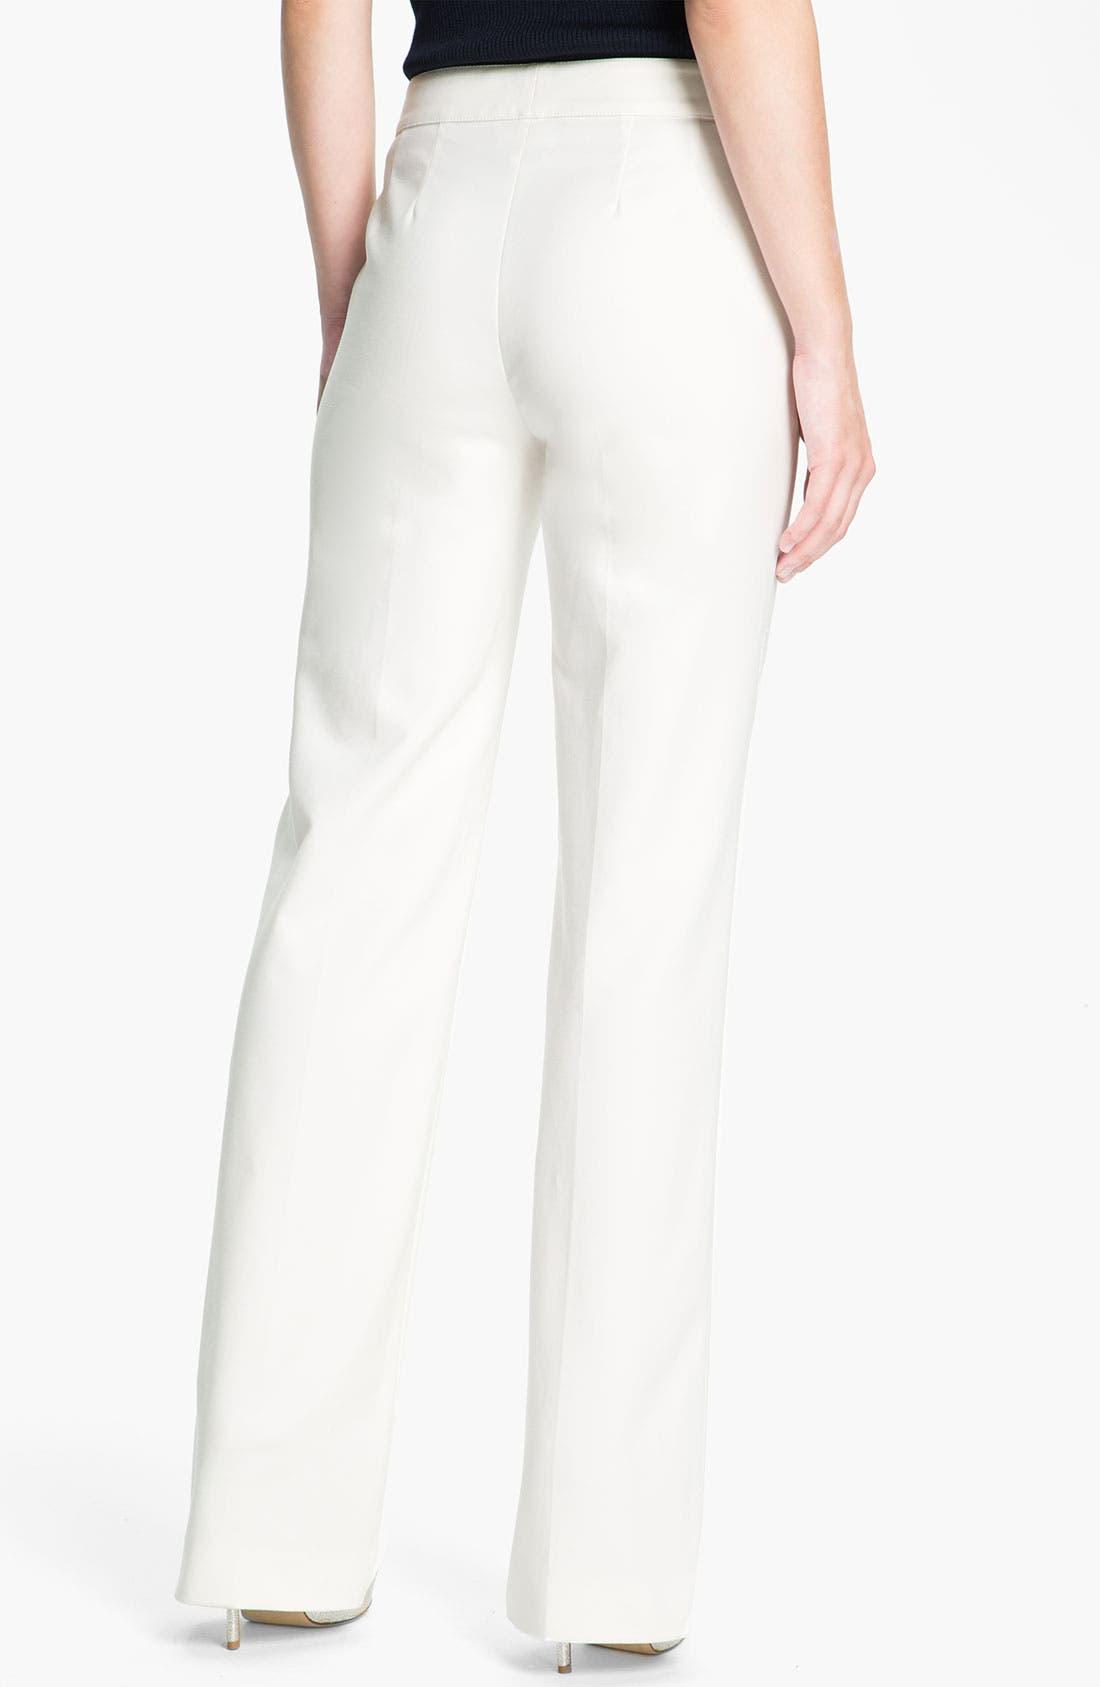 Alternate Image 3  - St. John Collection 'Shelley' Double Weave Stretch Cotton Pants